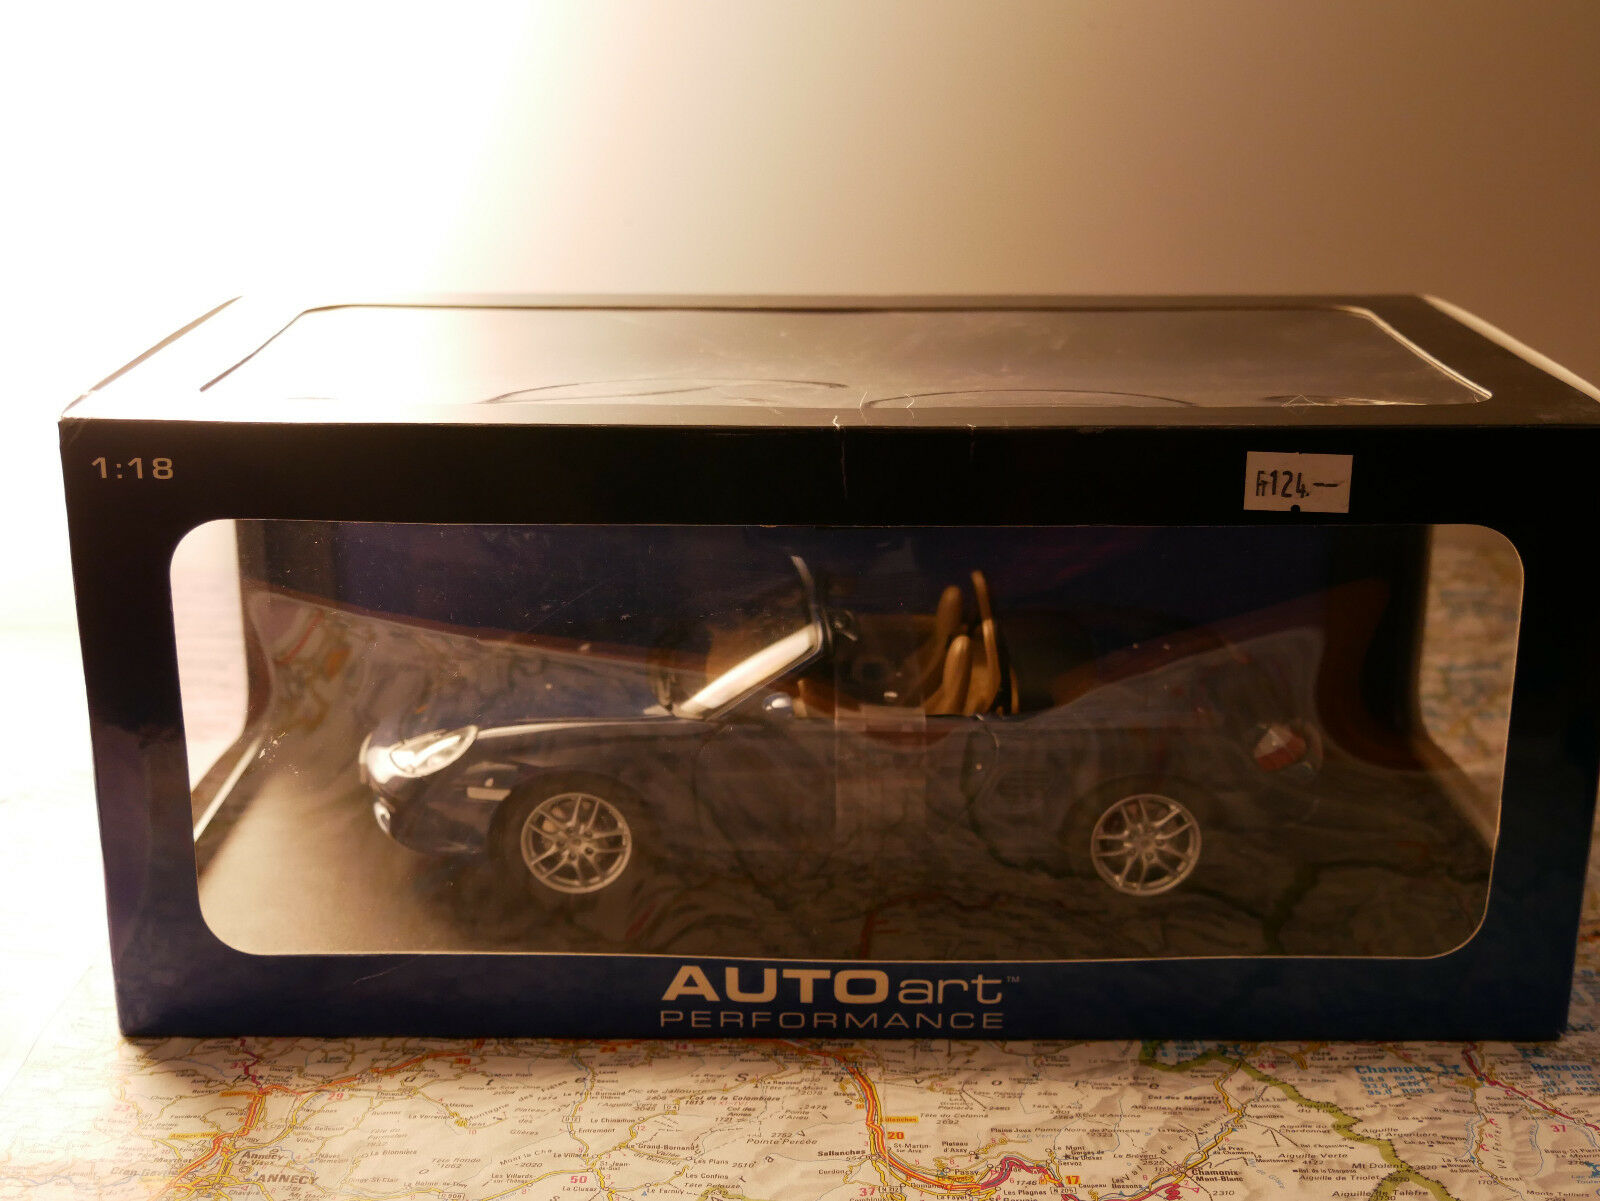 AUTOART PORSCHE BOXSTER S bleu 986 CABRIO FACELIFT ART.77881  1 18  NEW